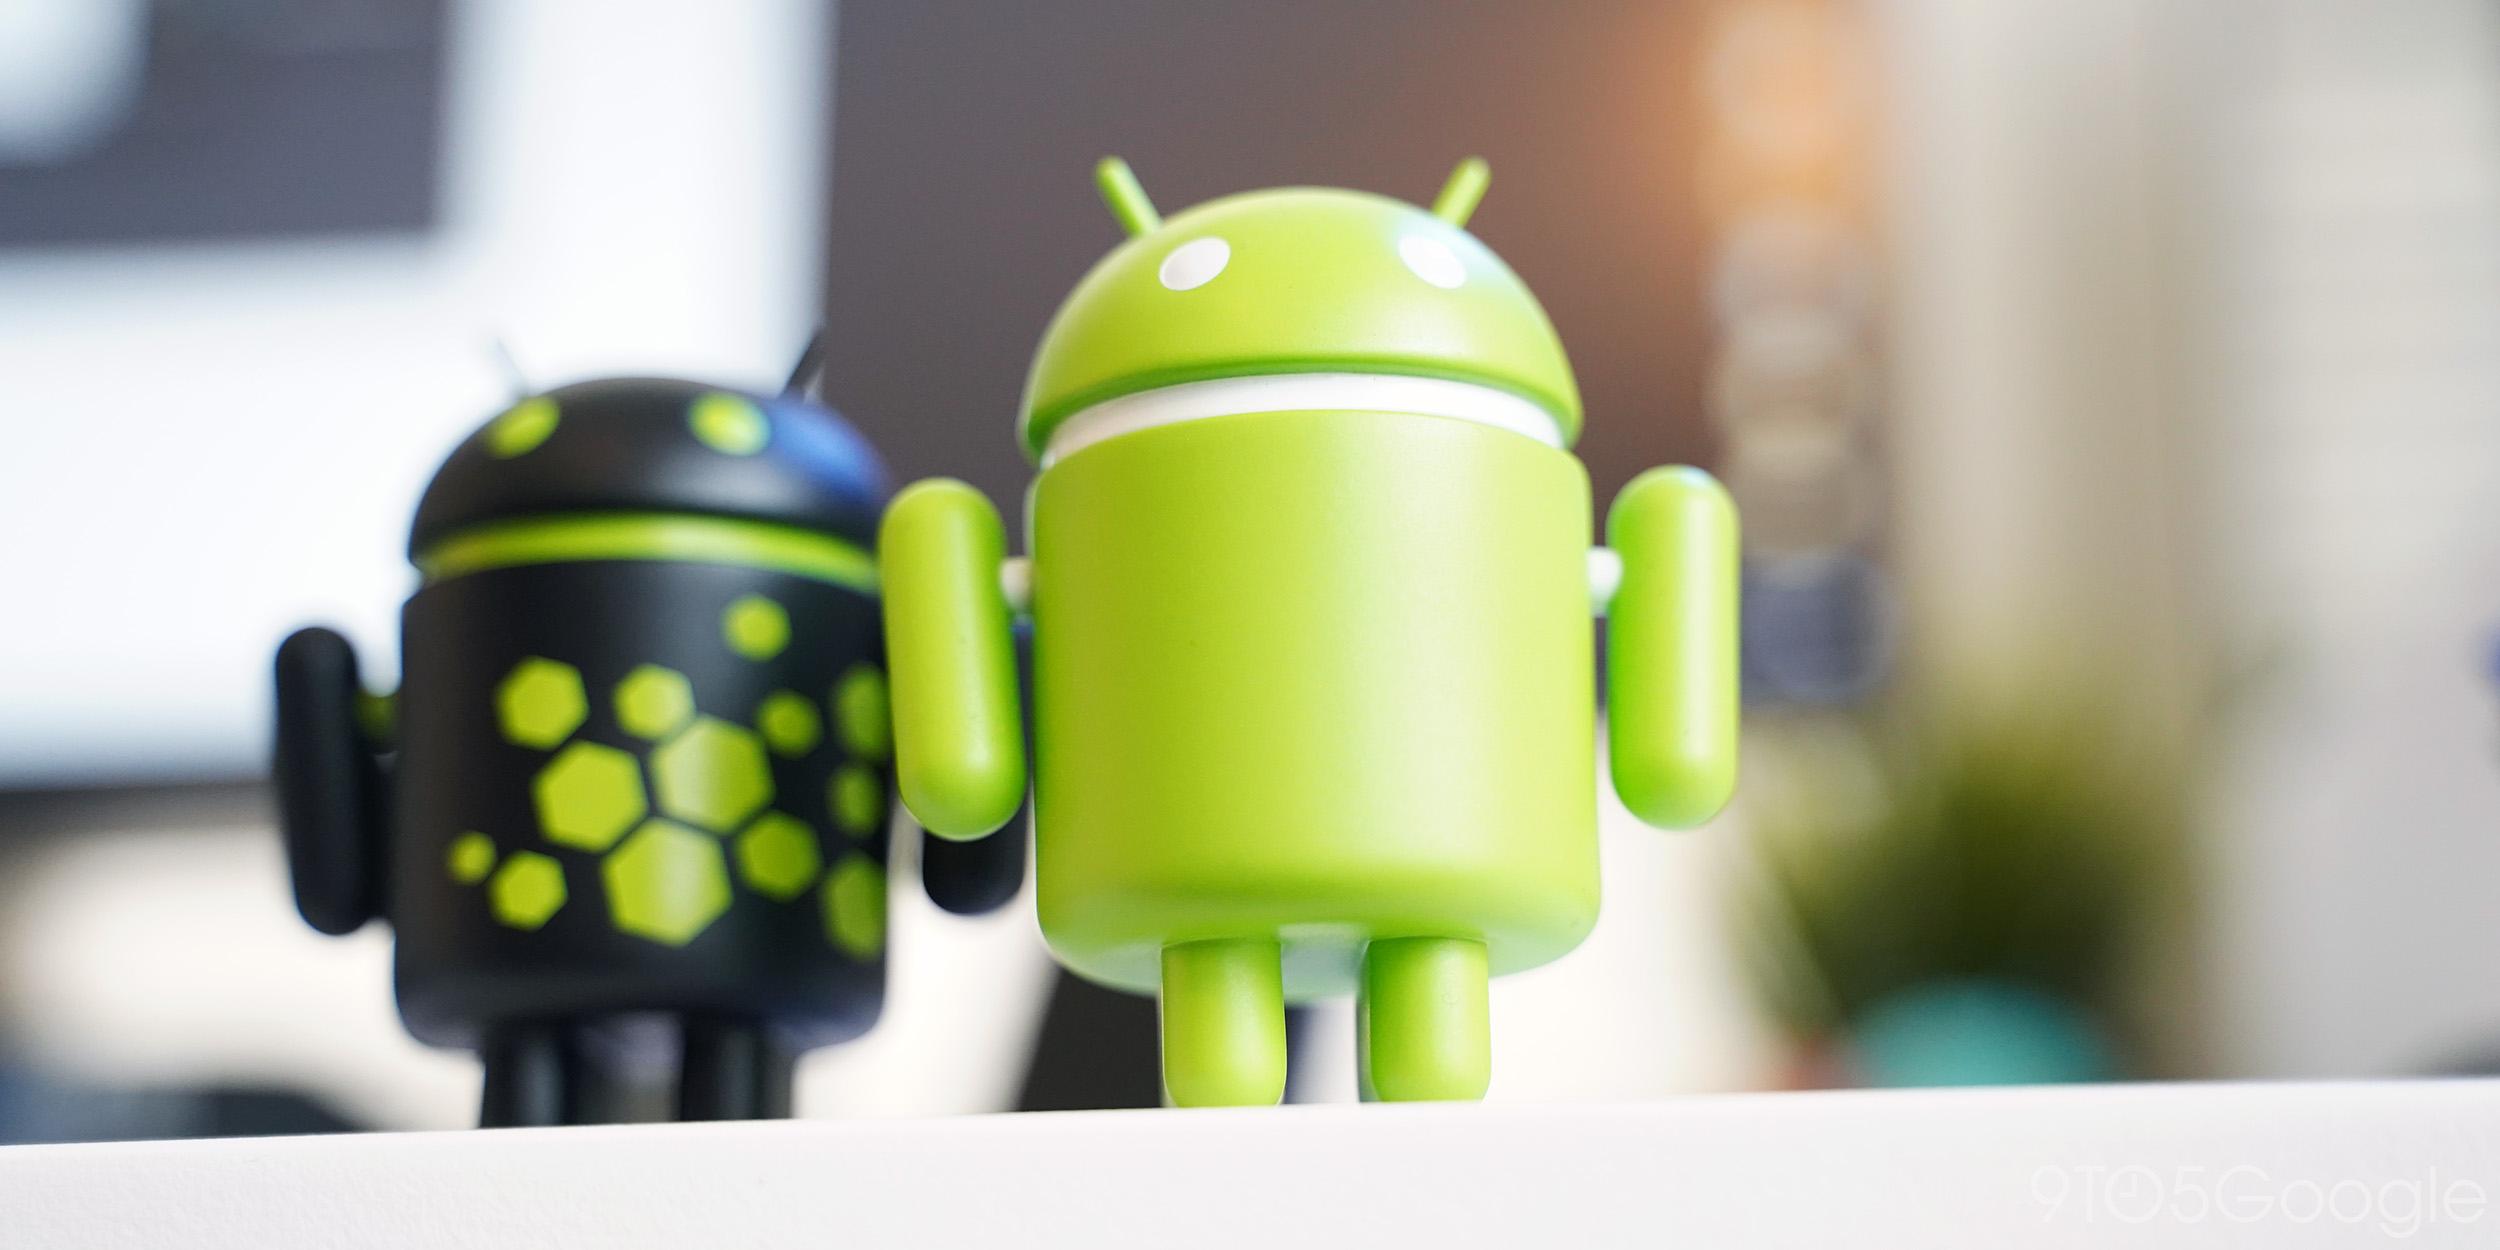 Google eröffnet den Android Q Bug Tracker, da mehr OEMs 2019 dem Beta-Programm beitreten